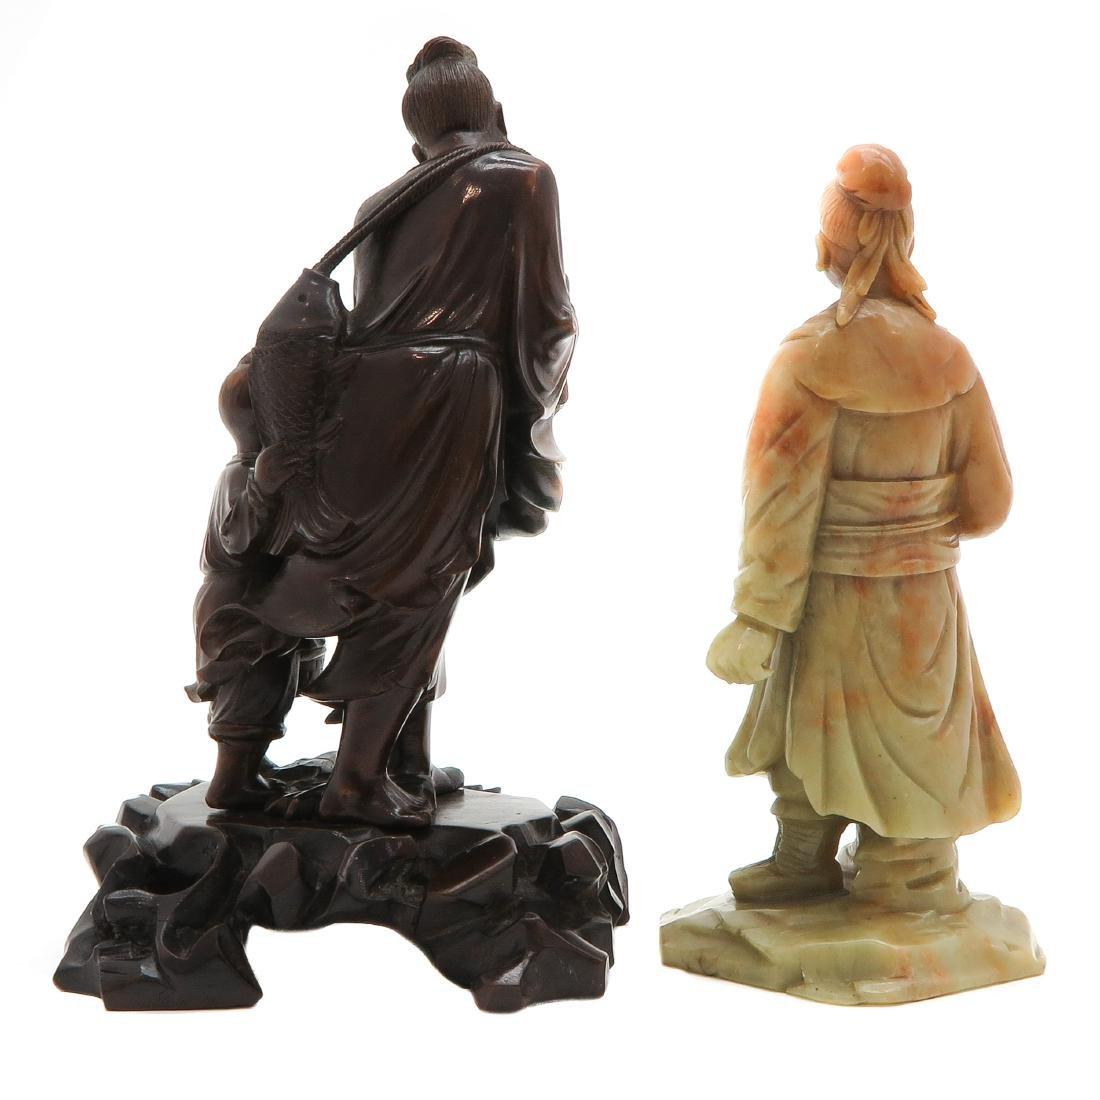 Lot of 2 Sculptures - 2